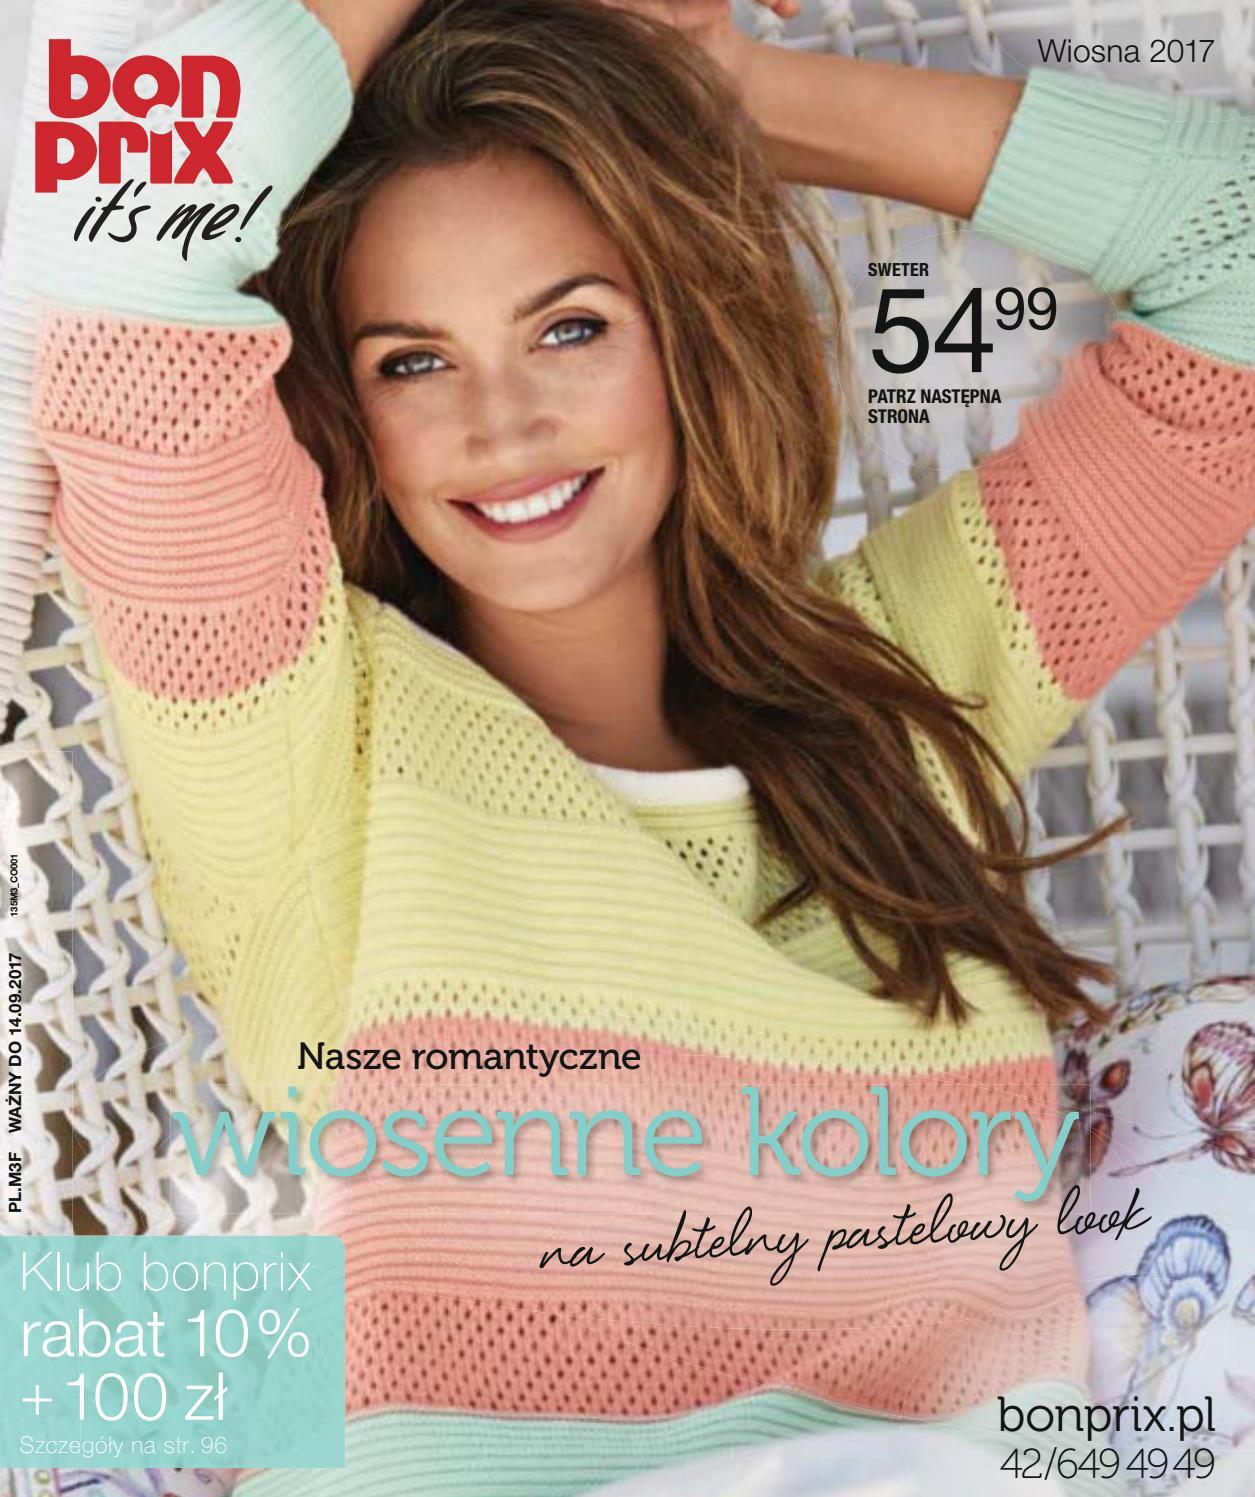 Bonprix katalog wiosna 2017 wa ny do by iulotka for Bonprix 2017